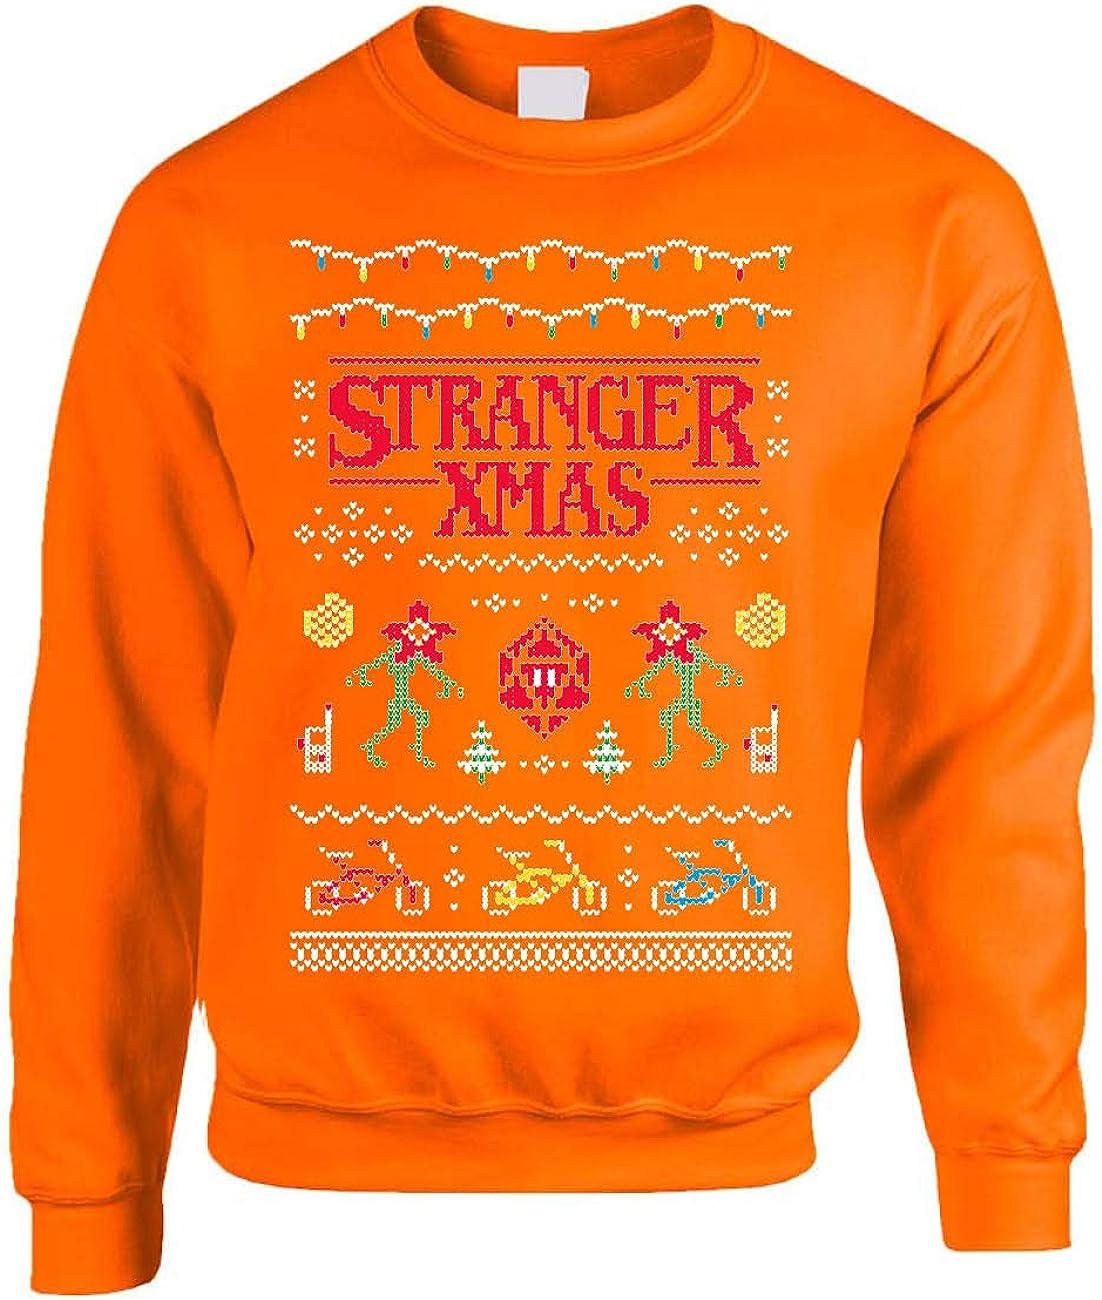 ALLNTRENDS Adult Sweatshirt Stranger Xmas Funny Ugly Christmas Sweatshirt